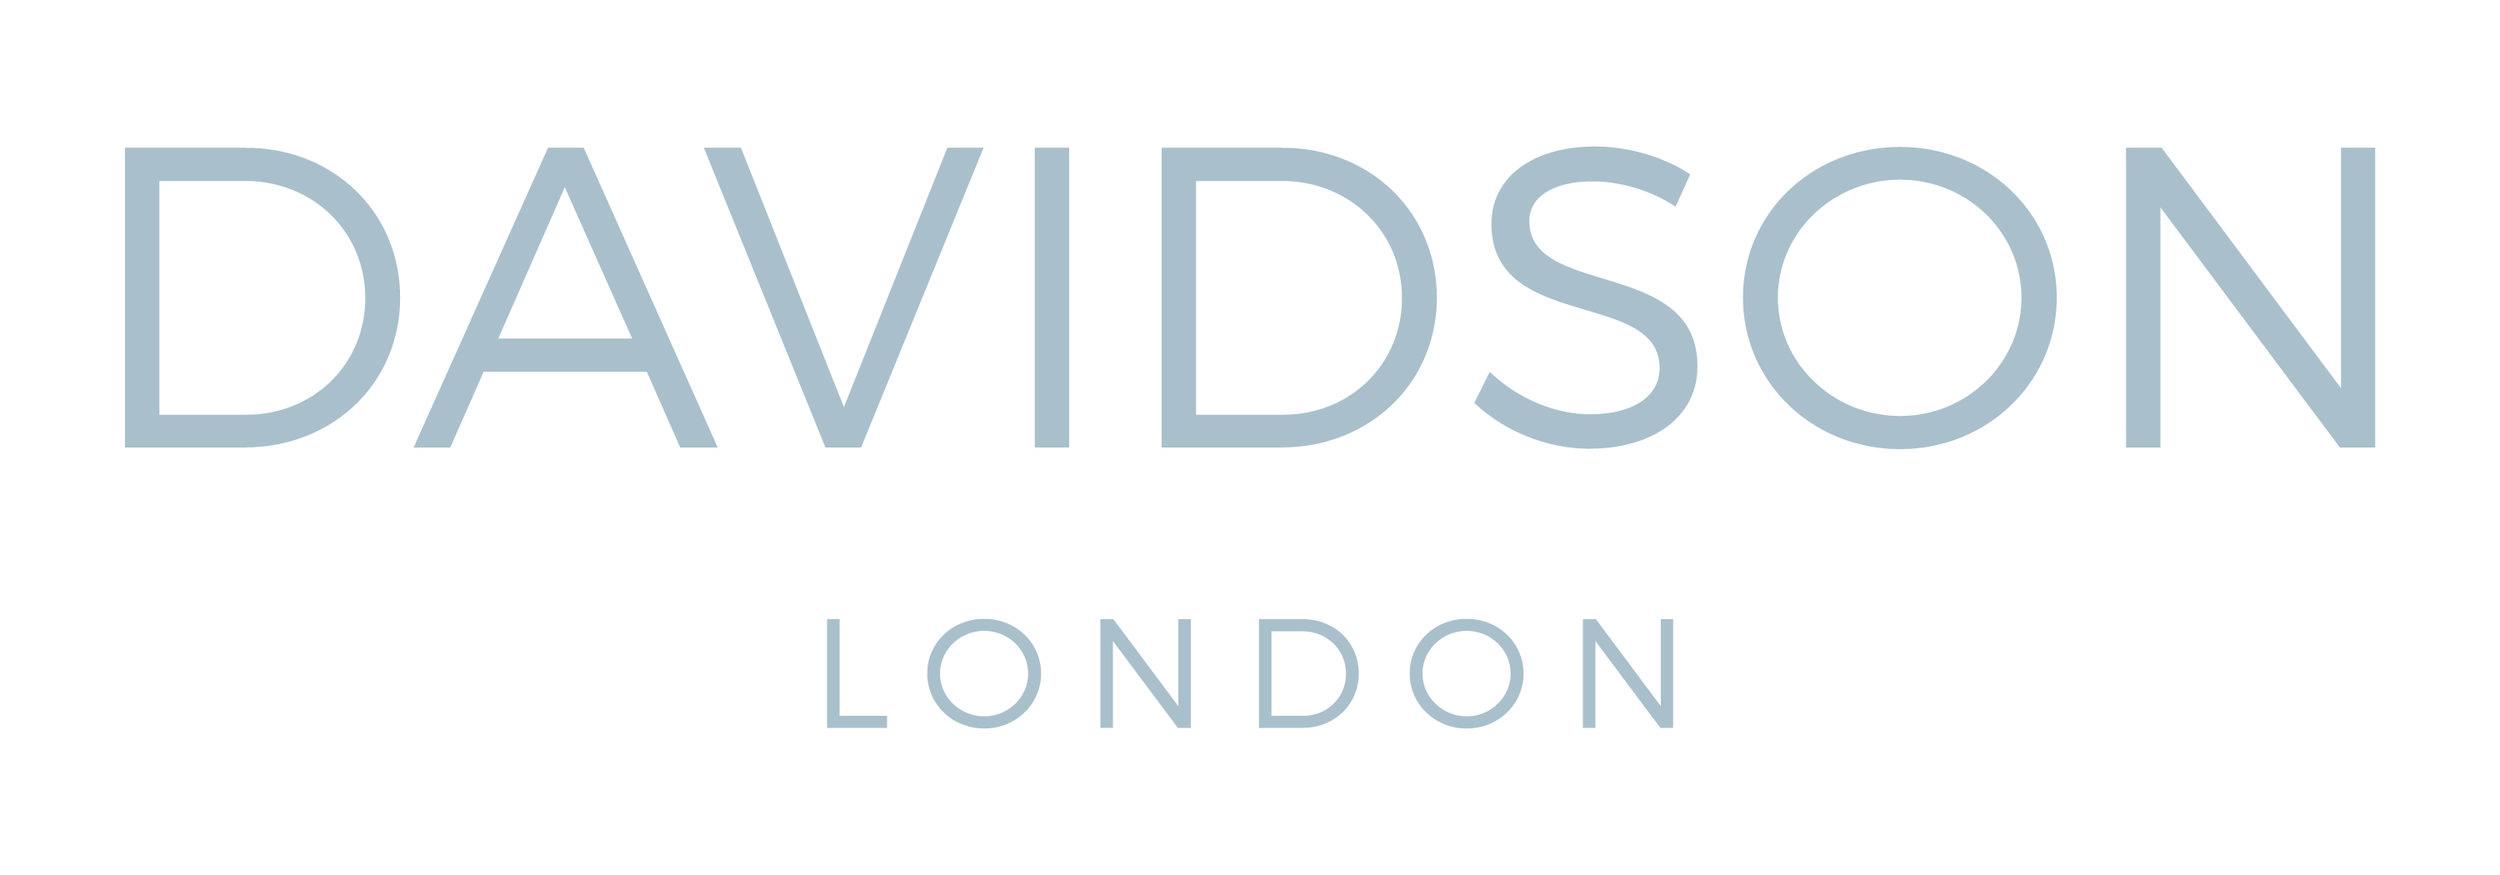 DavidsonLondon_logo_large.jpg